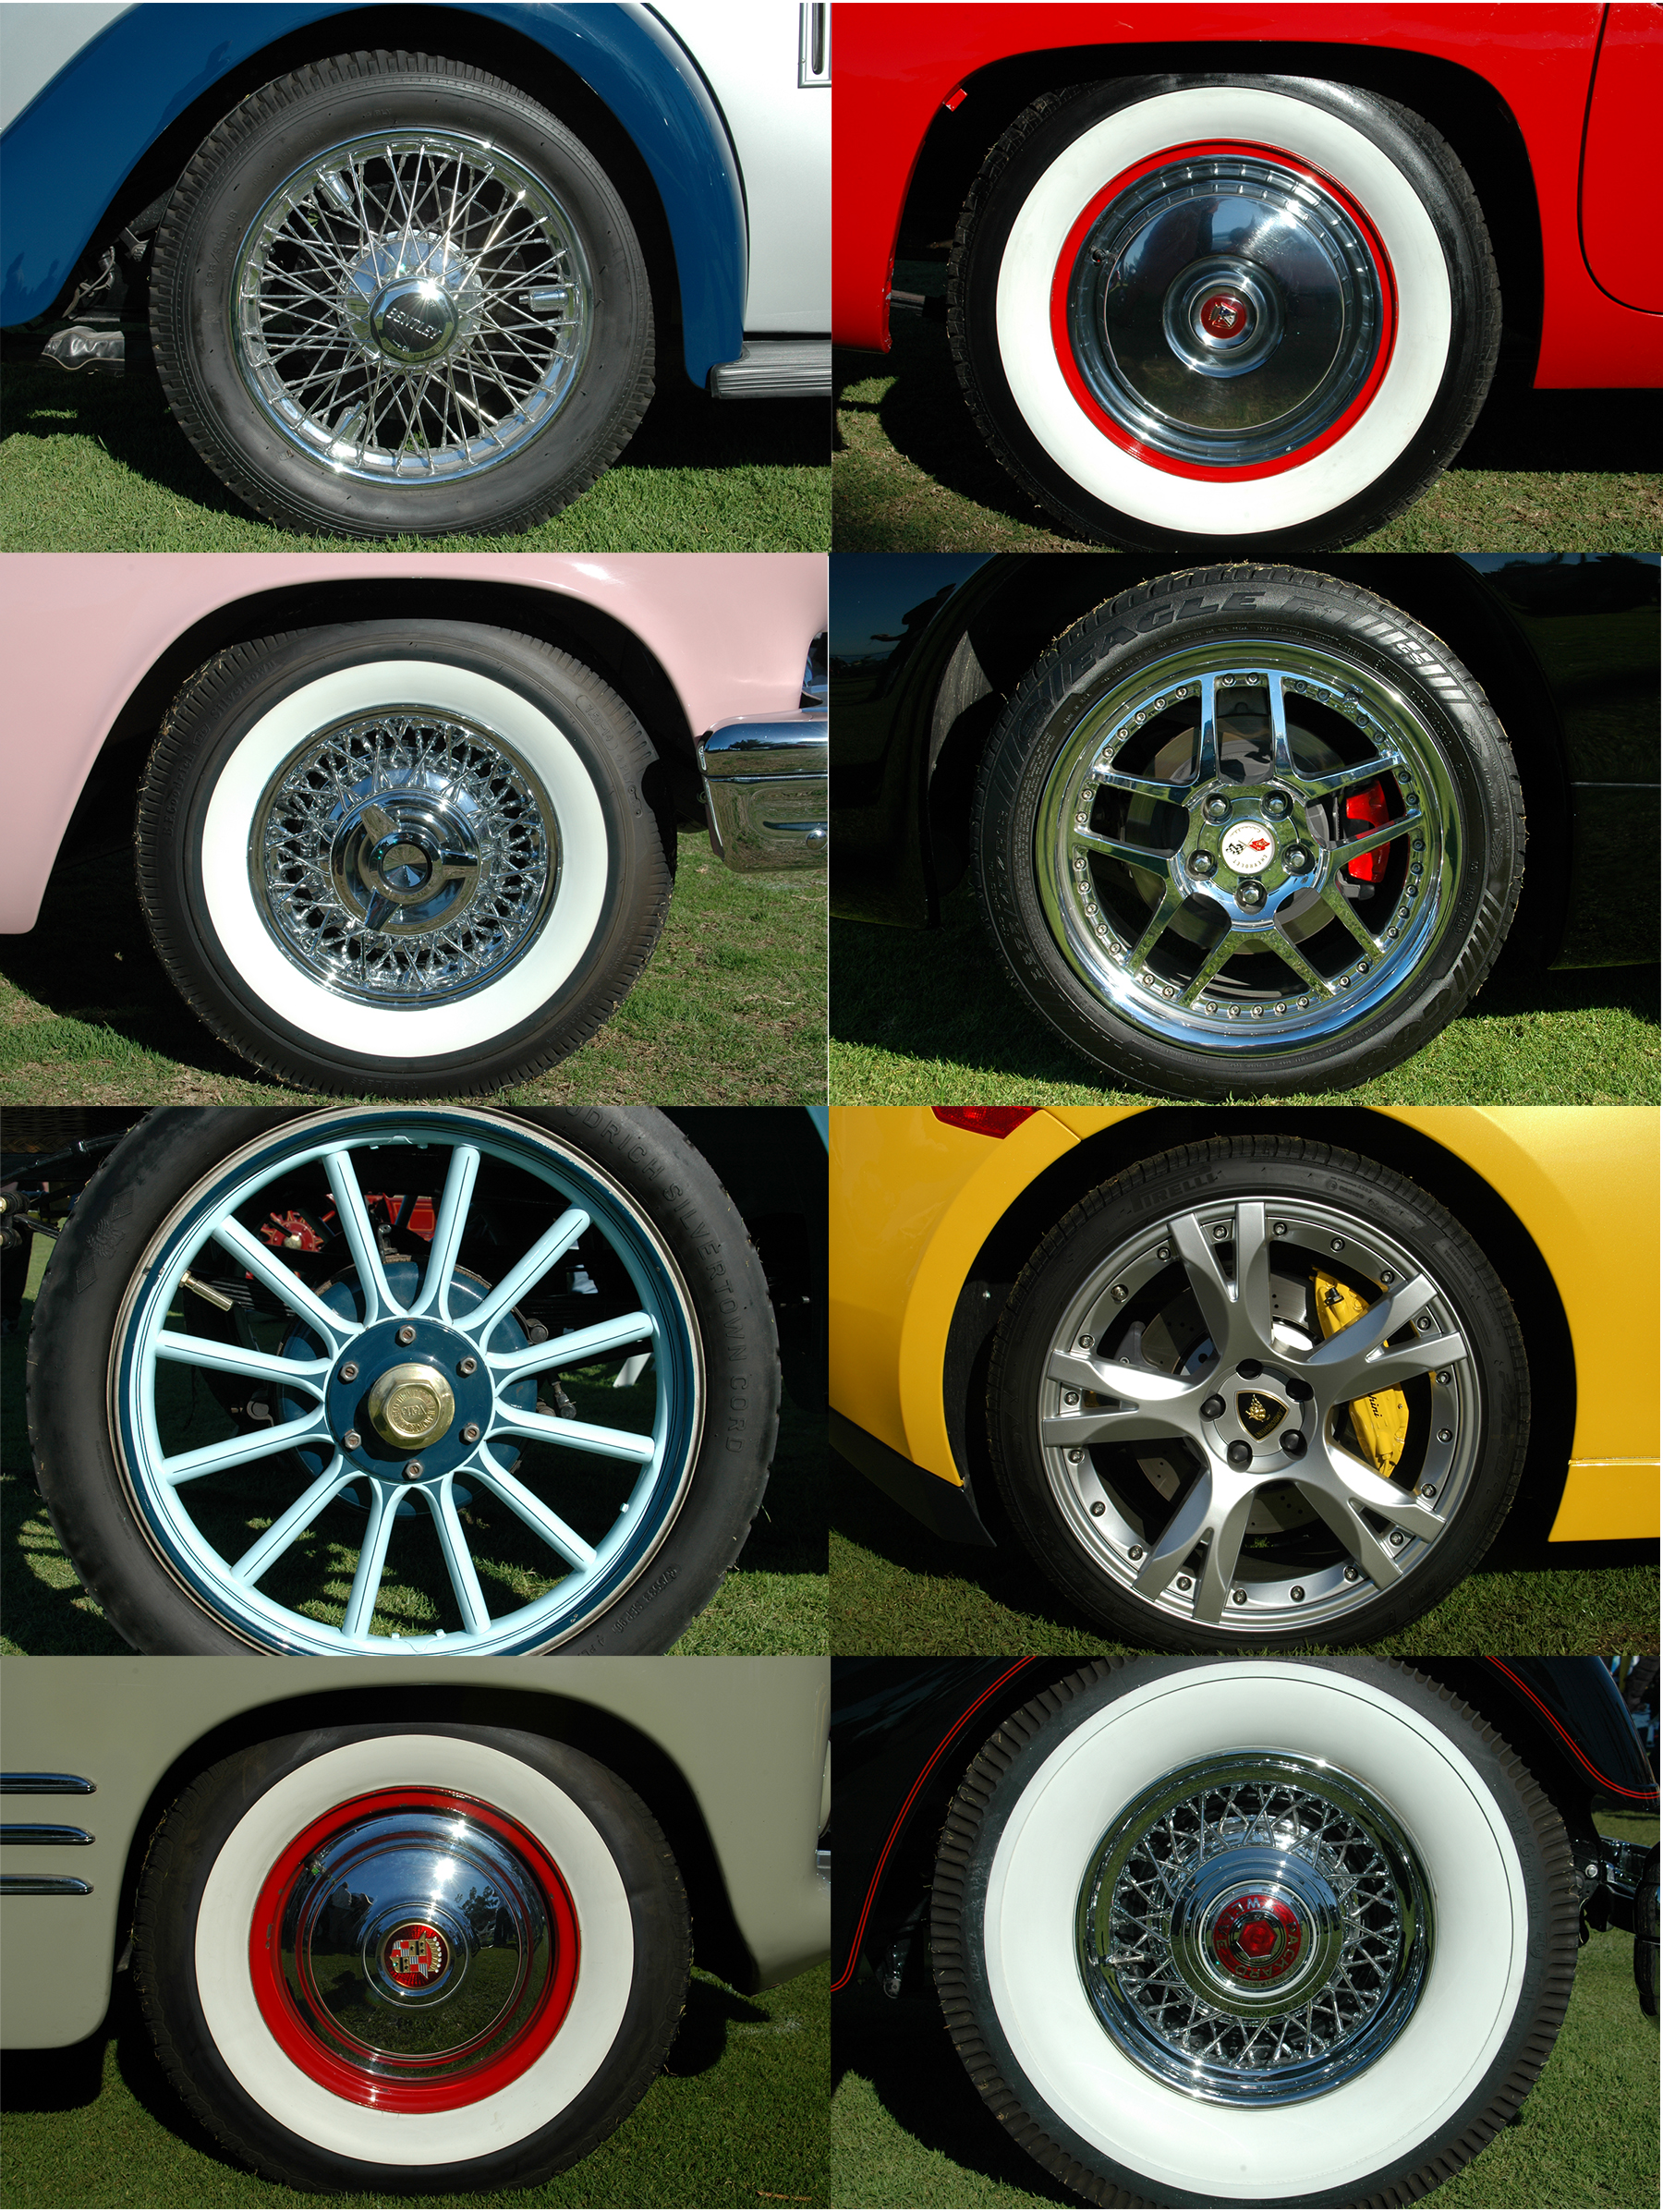 Joe Dobrow photo of vintage car tires